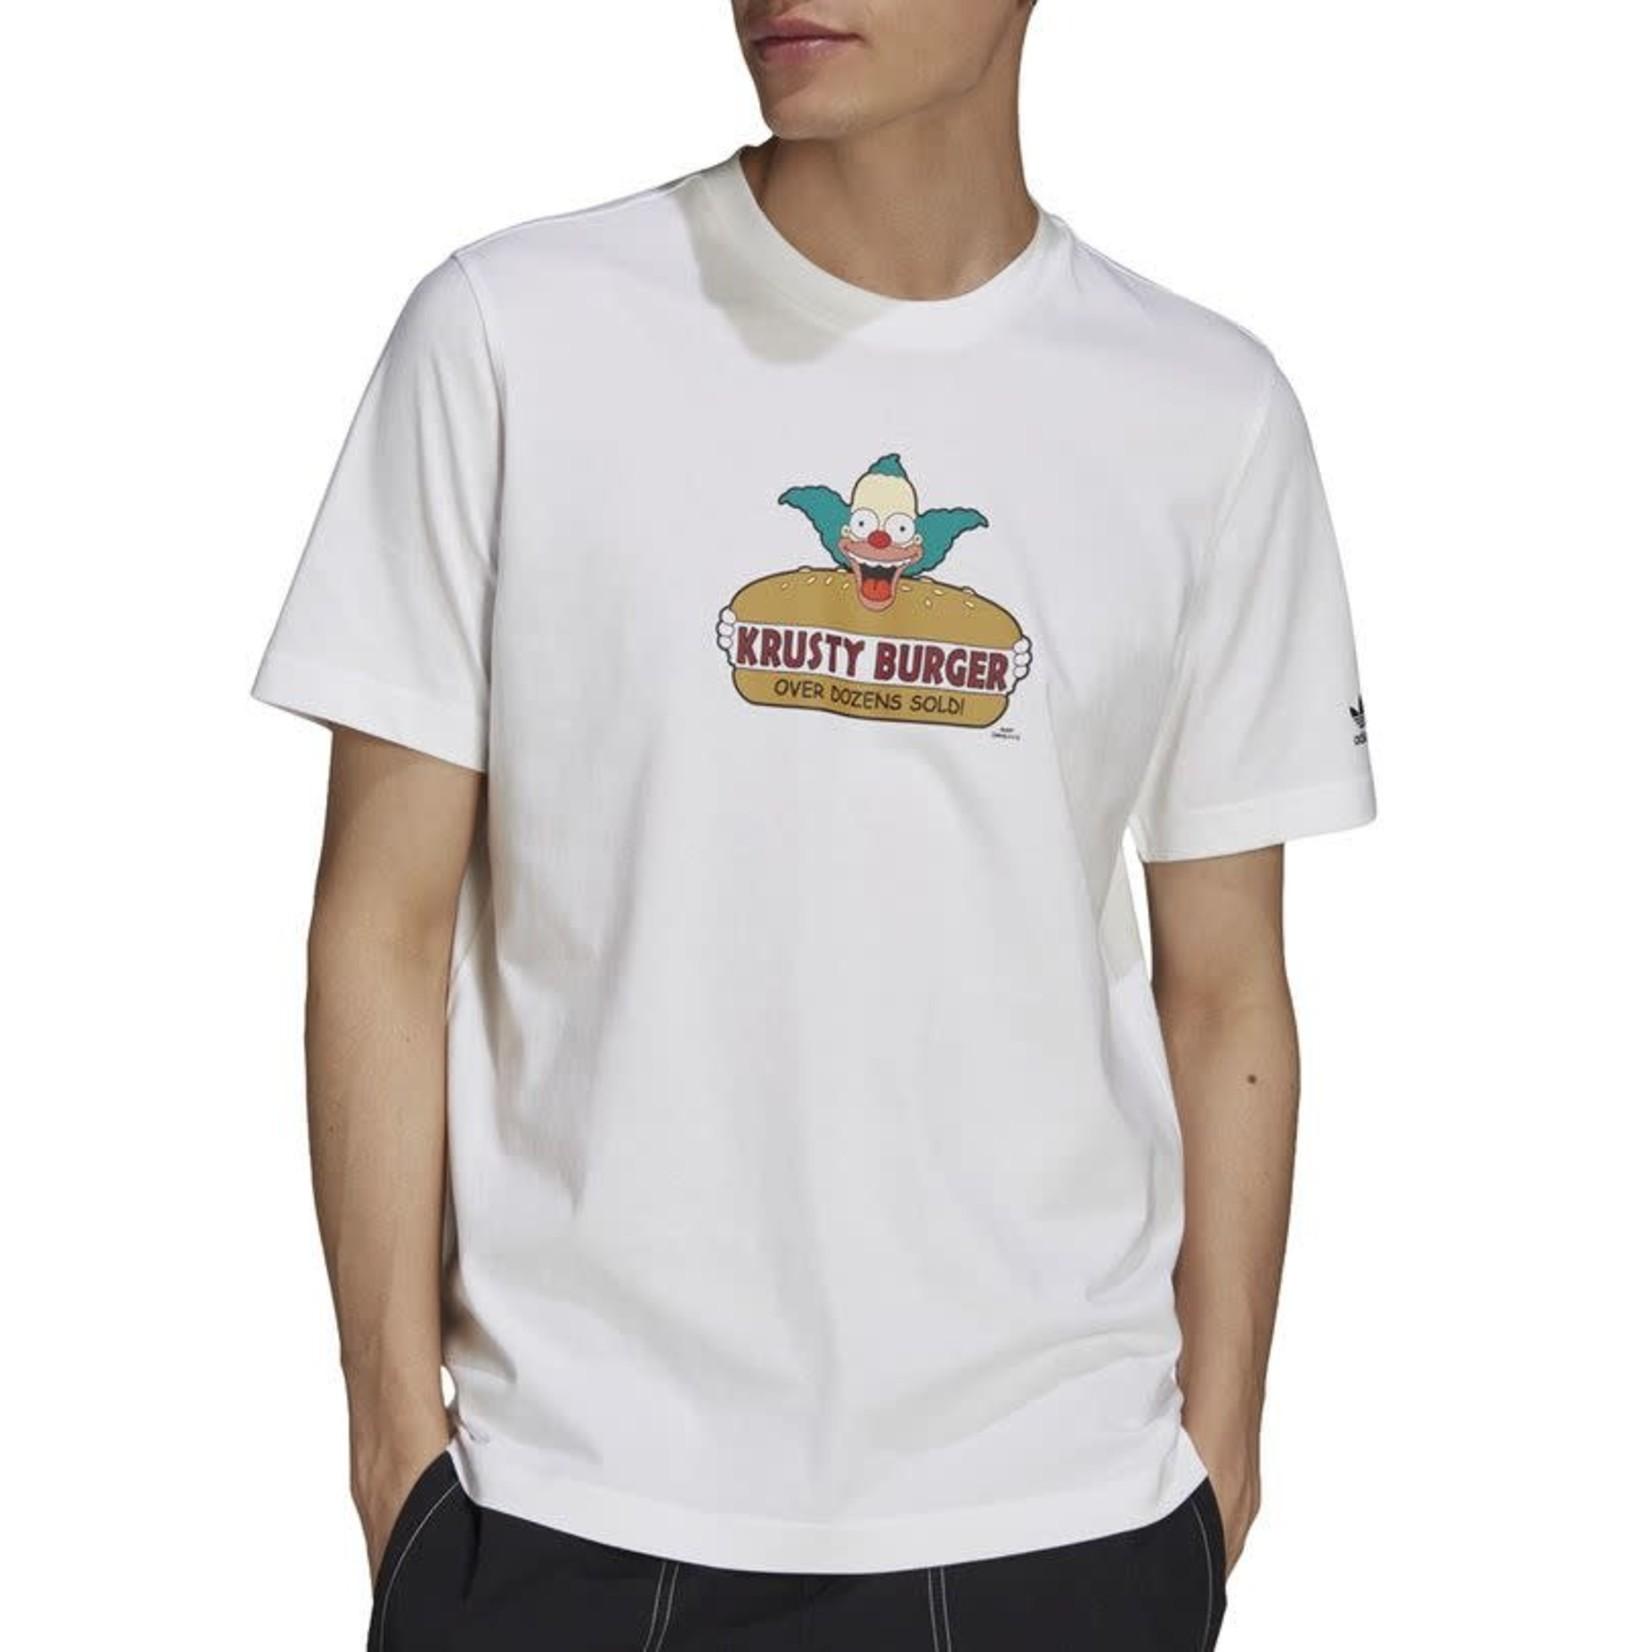 Adidas Adidas : Simpson Krusty Burger SS Tee